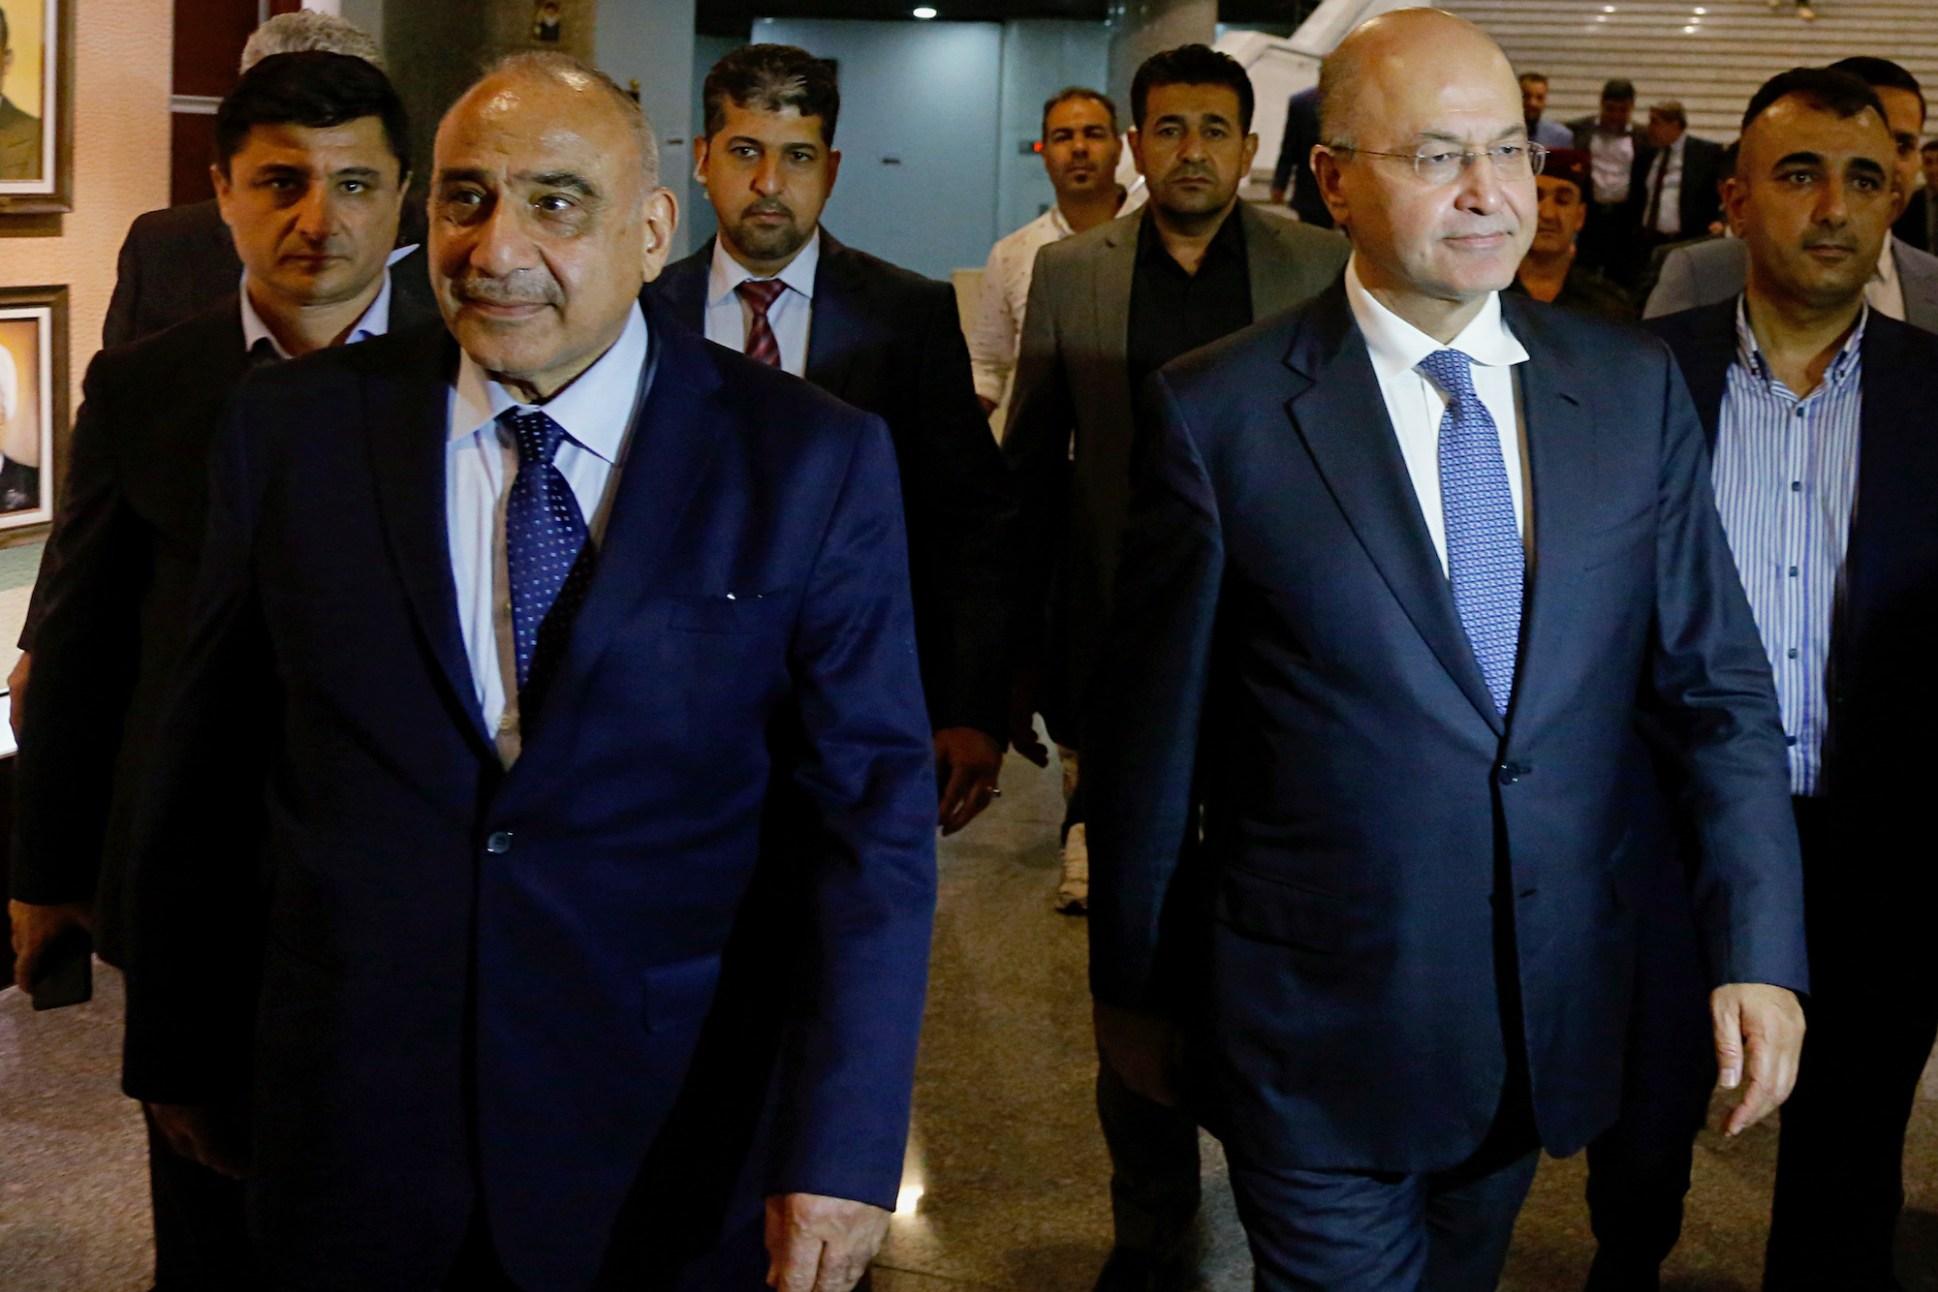 Newly elected Iraqi President Barham Salih with newly elected prime minister Adel Abdul Mahdi